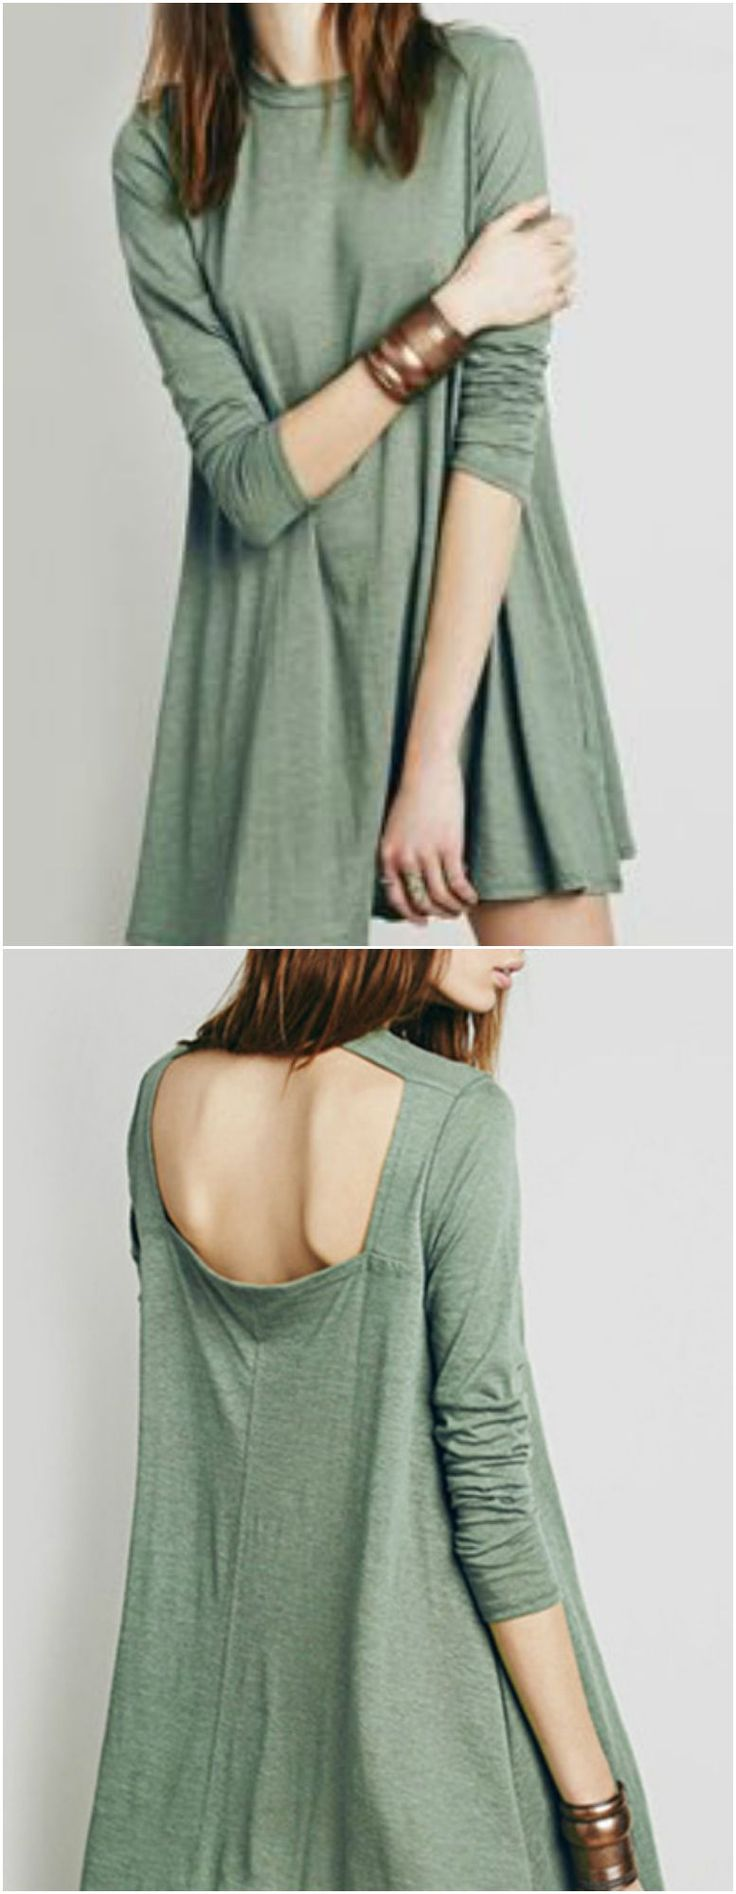 Open back green dress